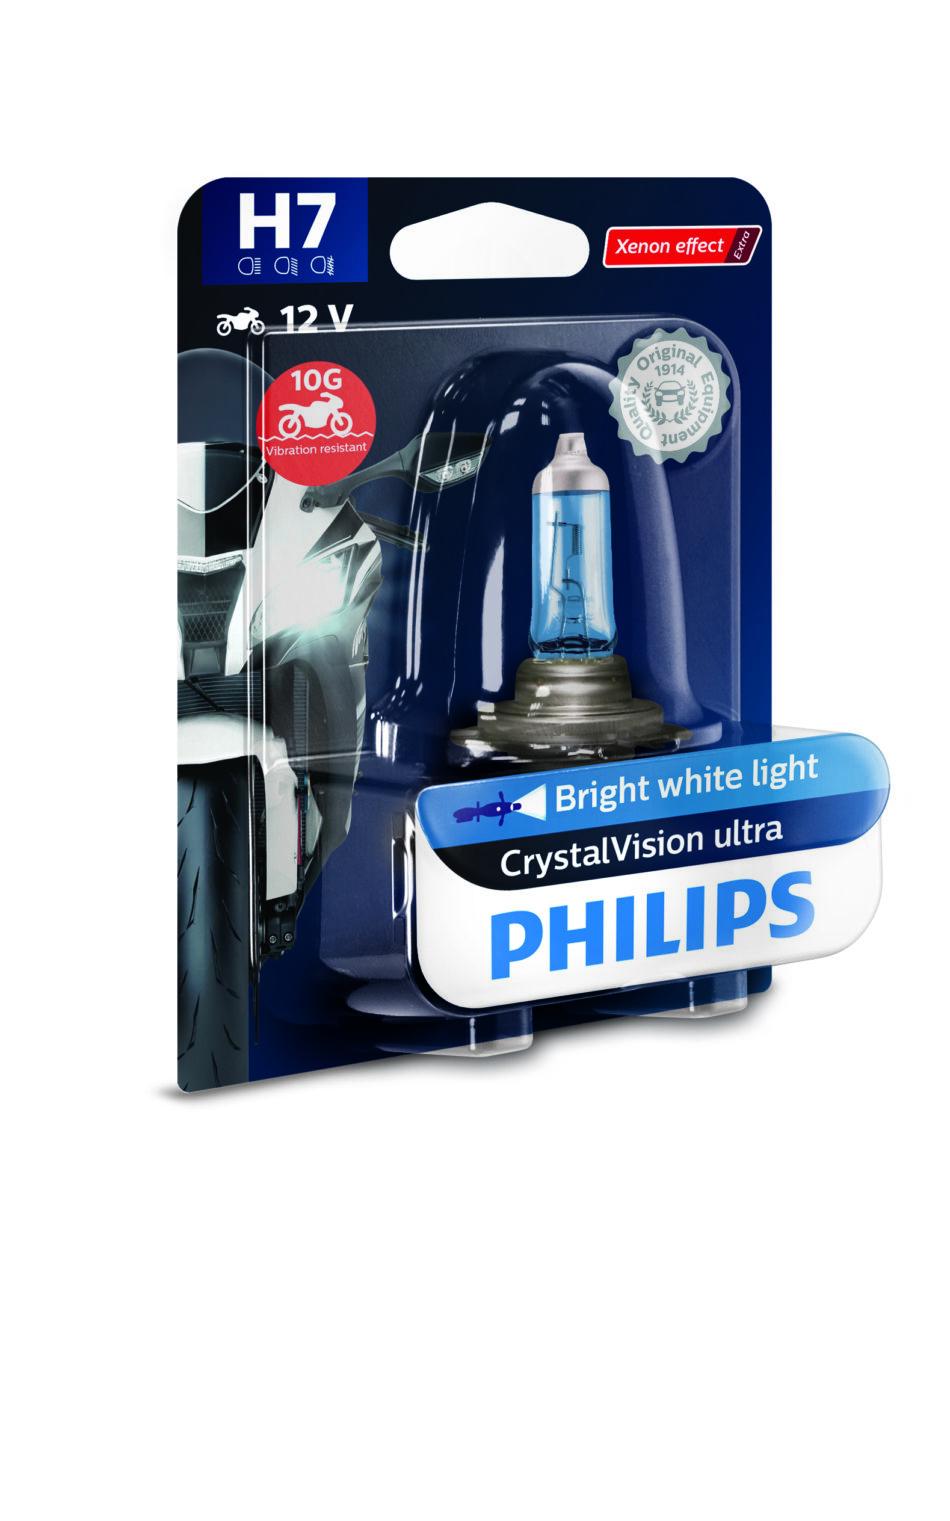 Lampada Farol Philips H7 12v 55w Cristal Vision Moto (12972cvmbw) Xtz Tenere 250 - Cbr 600rr/1000 - Gl1800 - Vtx1800 -